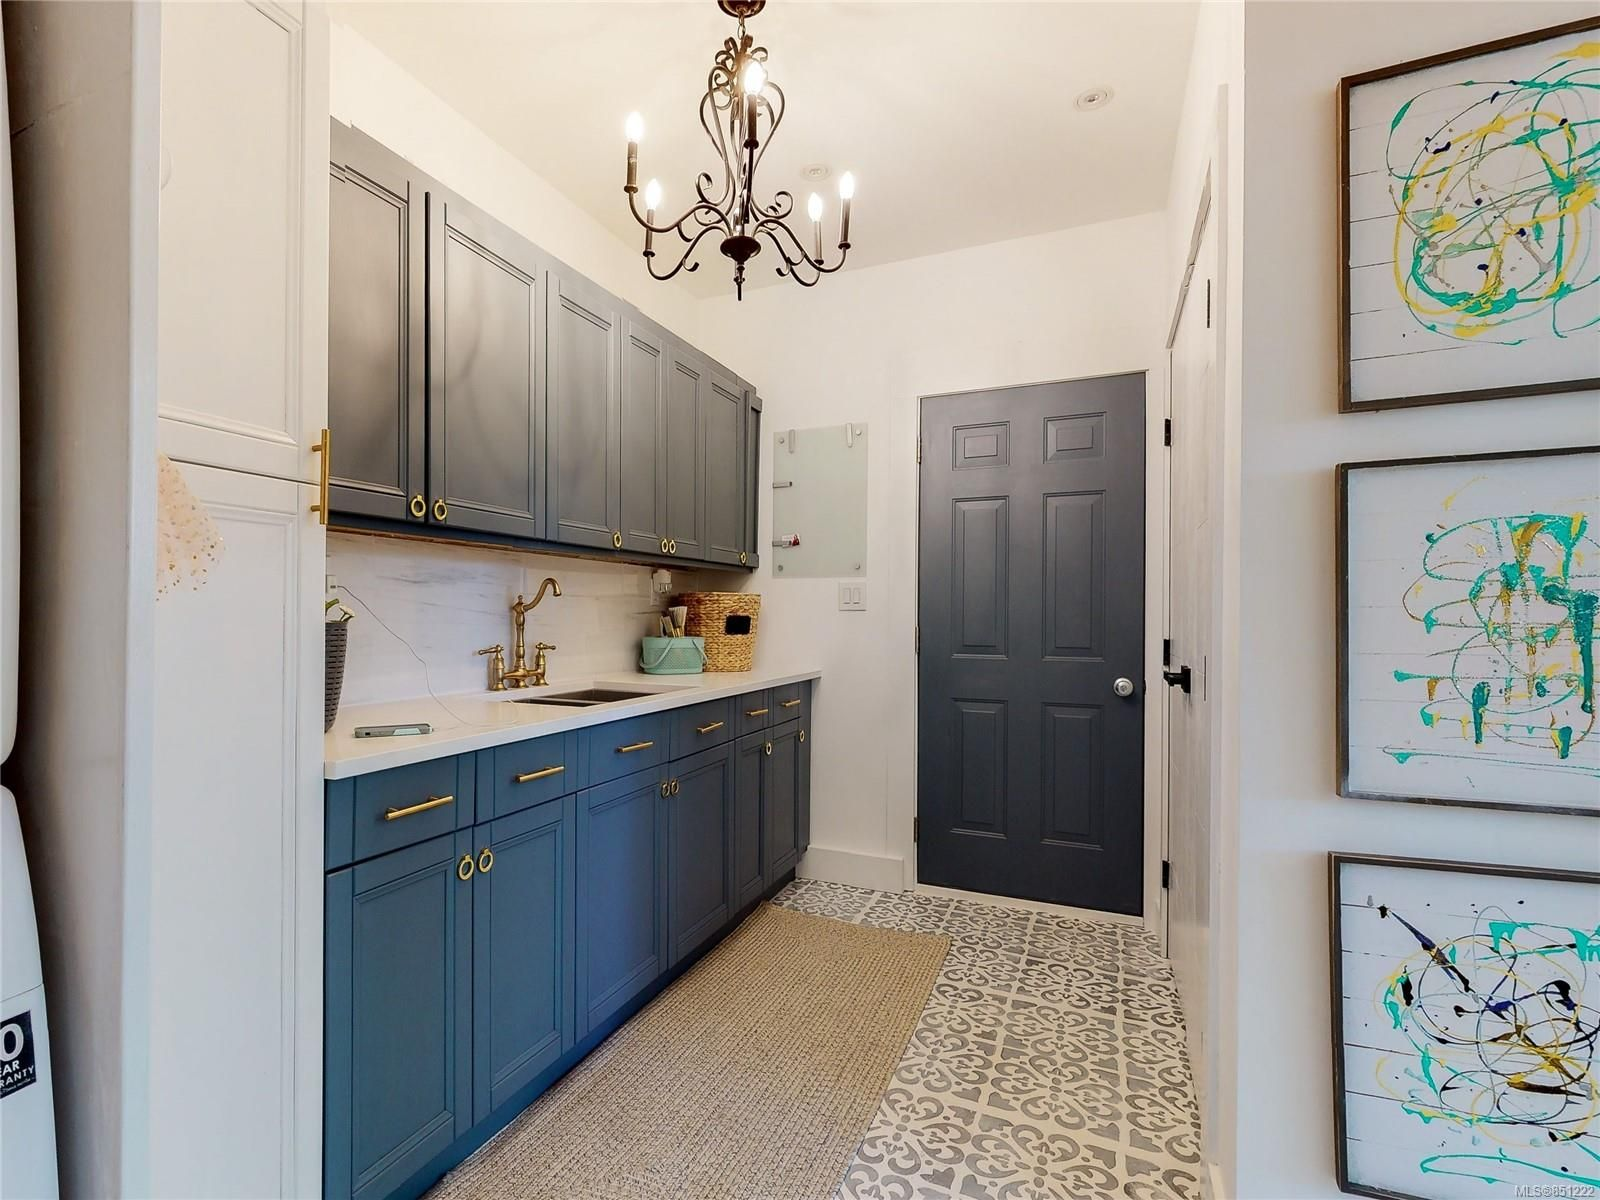 Photo 27: Photos: 2525 11th Ave in : PA Port Alberni House for sale (Port Alberni)  : MLS®# 851222